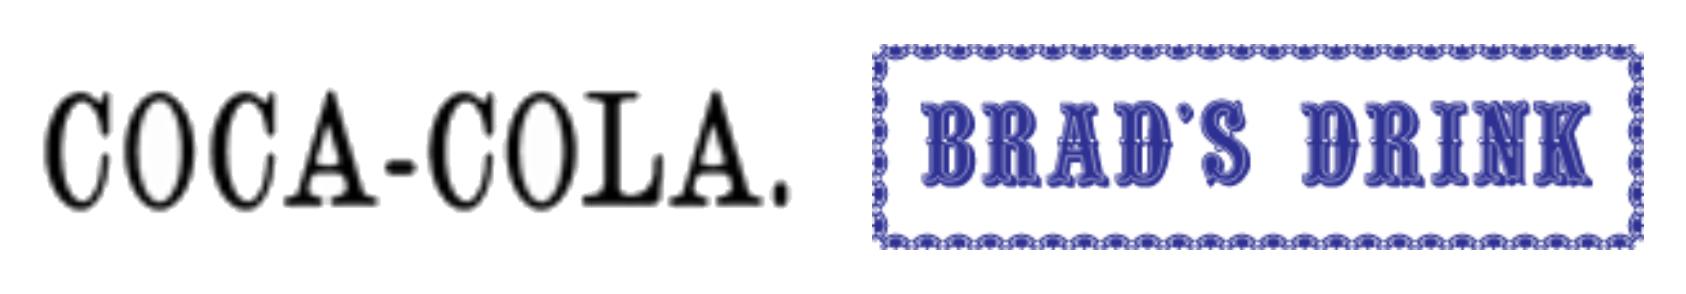 Begining of Coca-Cola logo